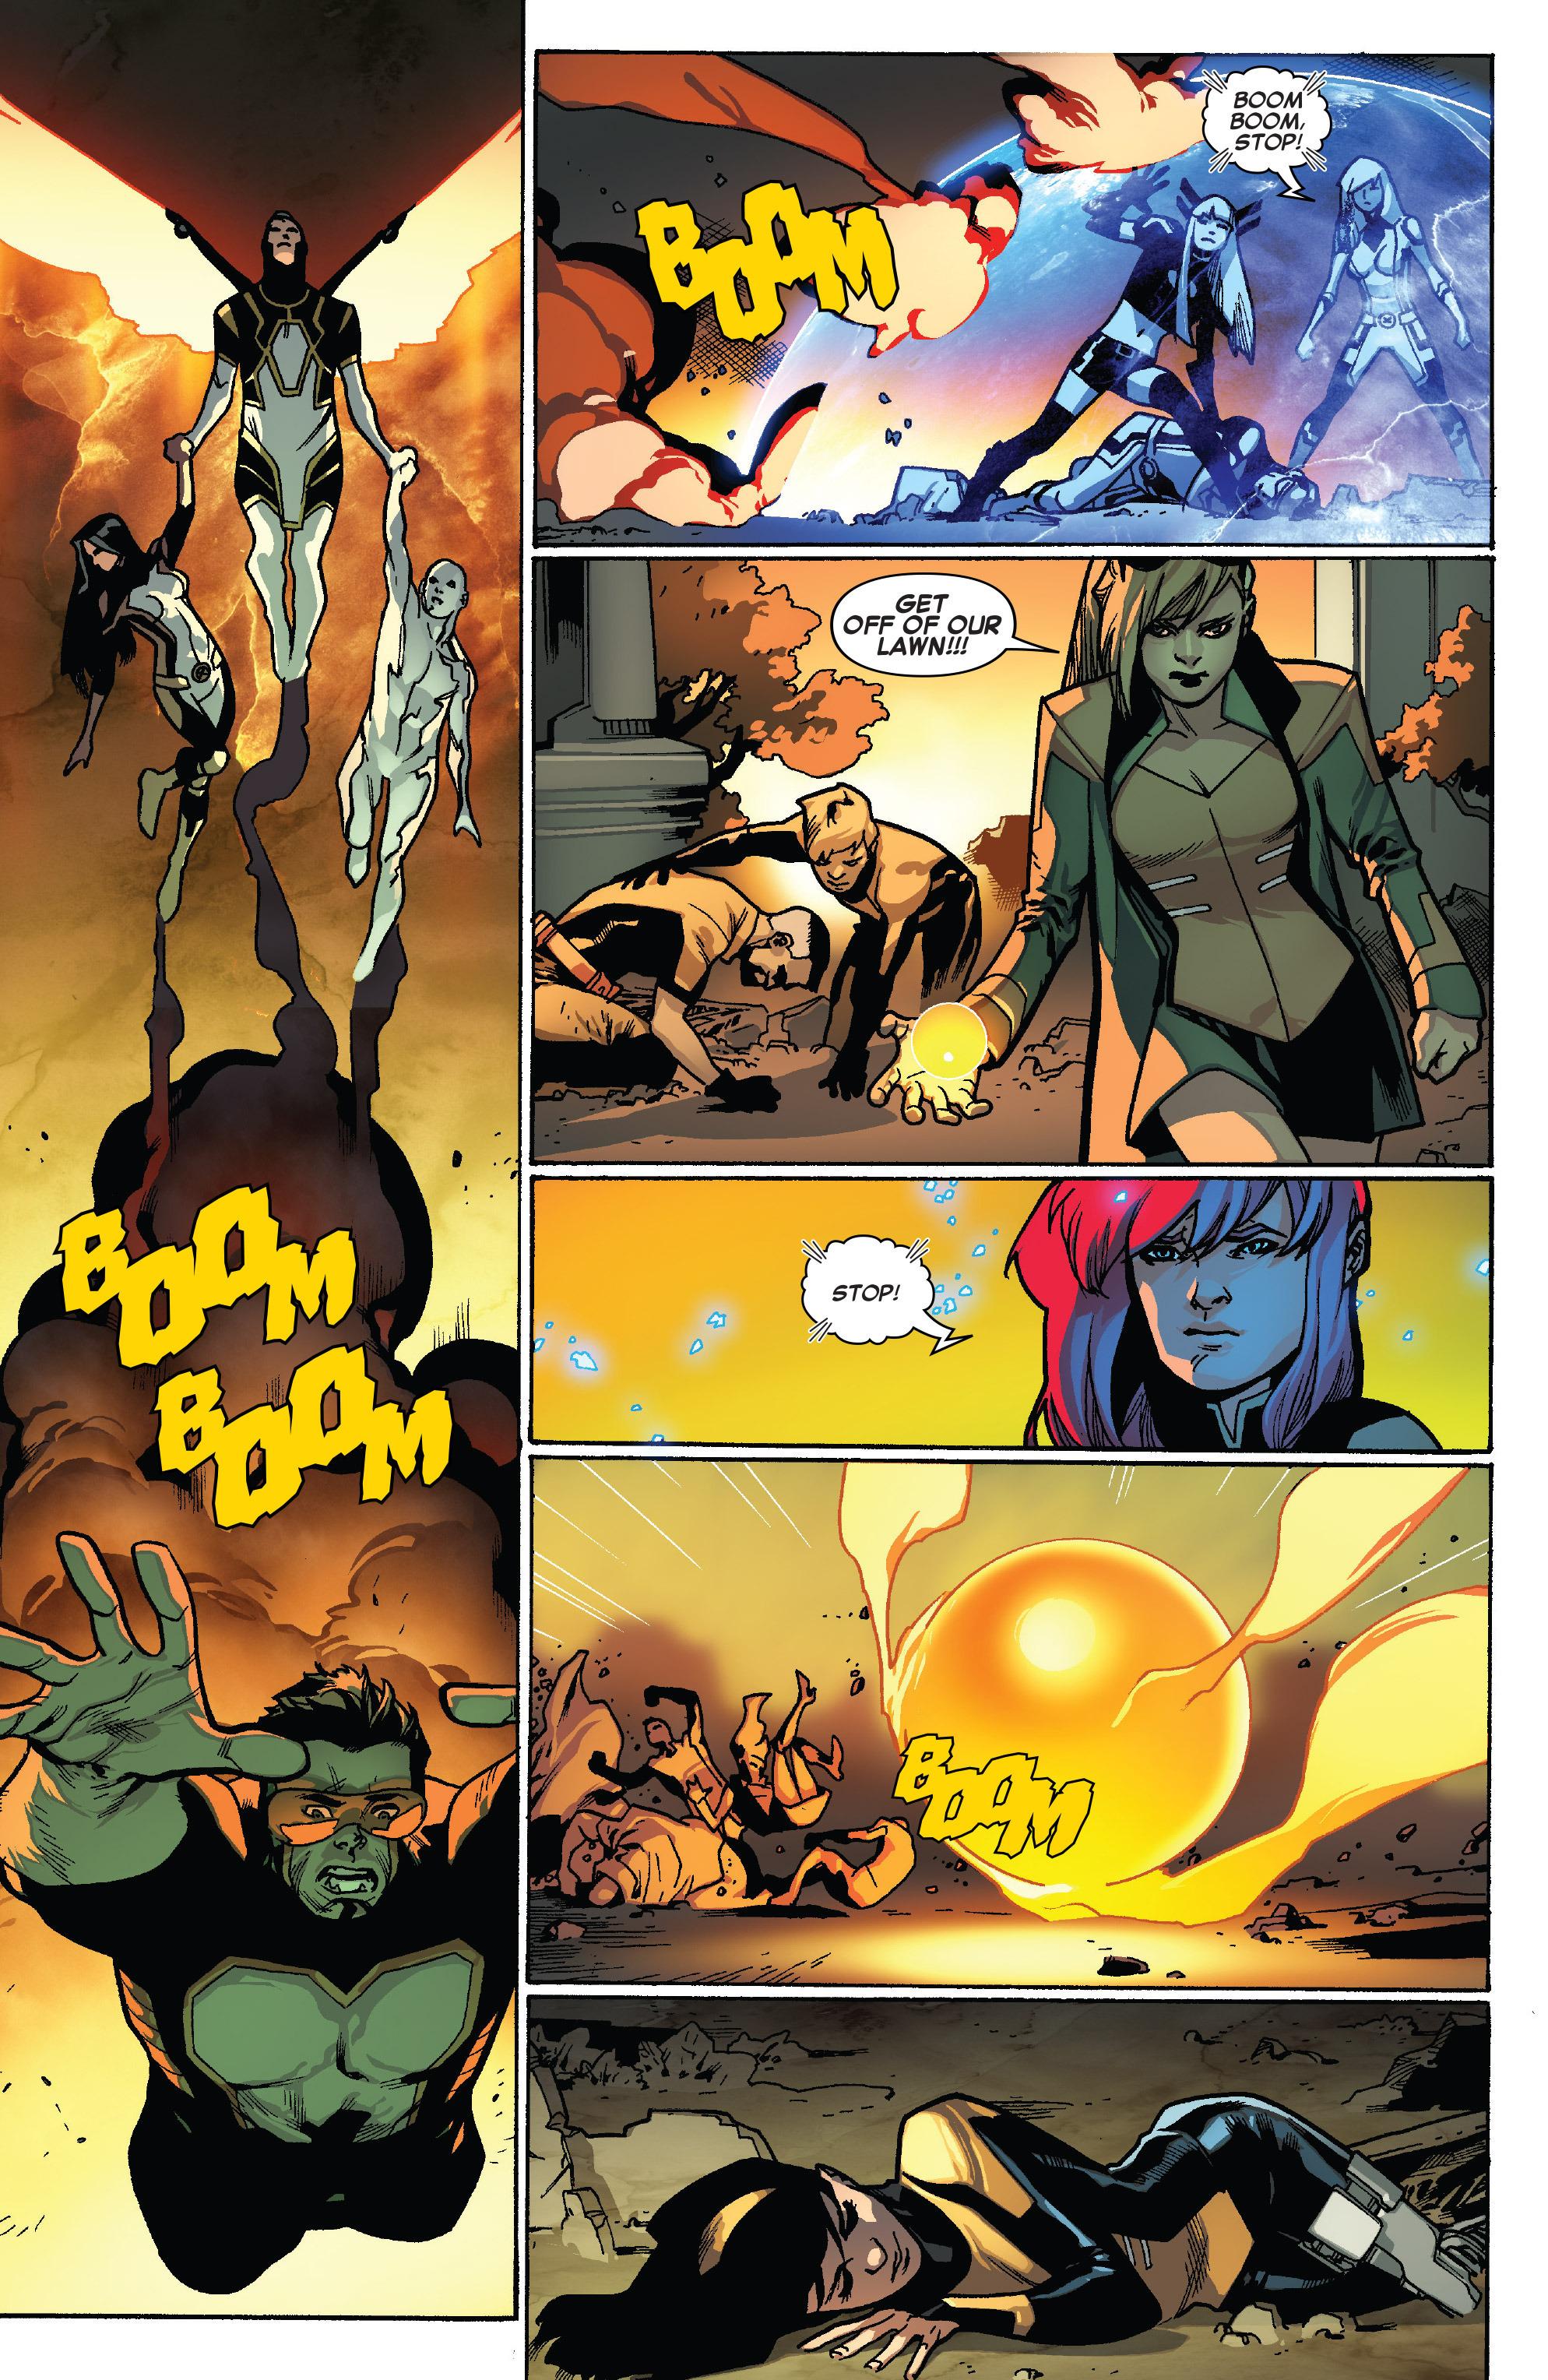 All-New X-Men (2013) chap 41 pic 14